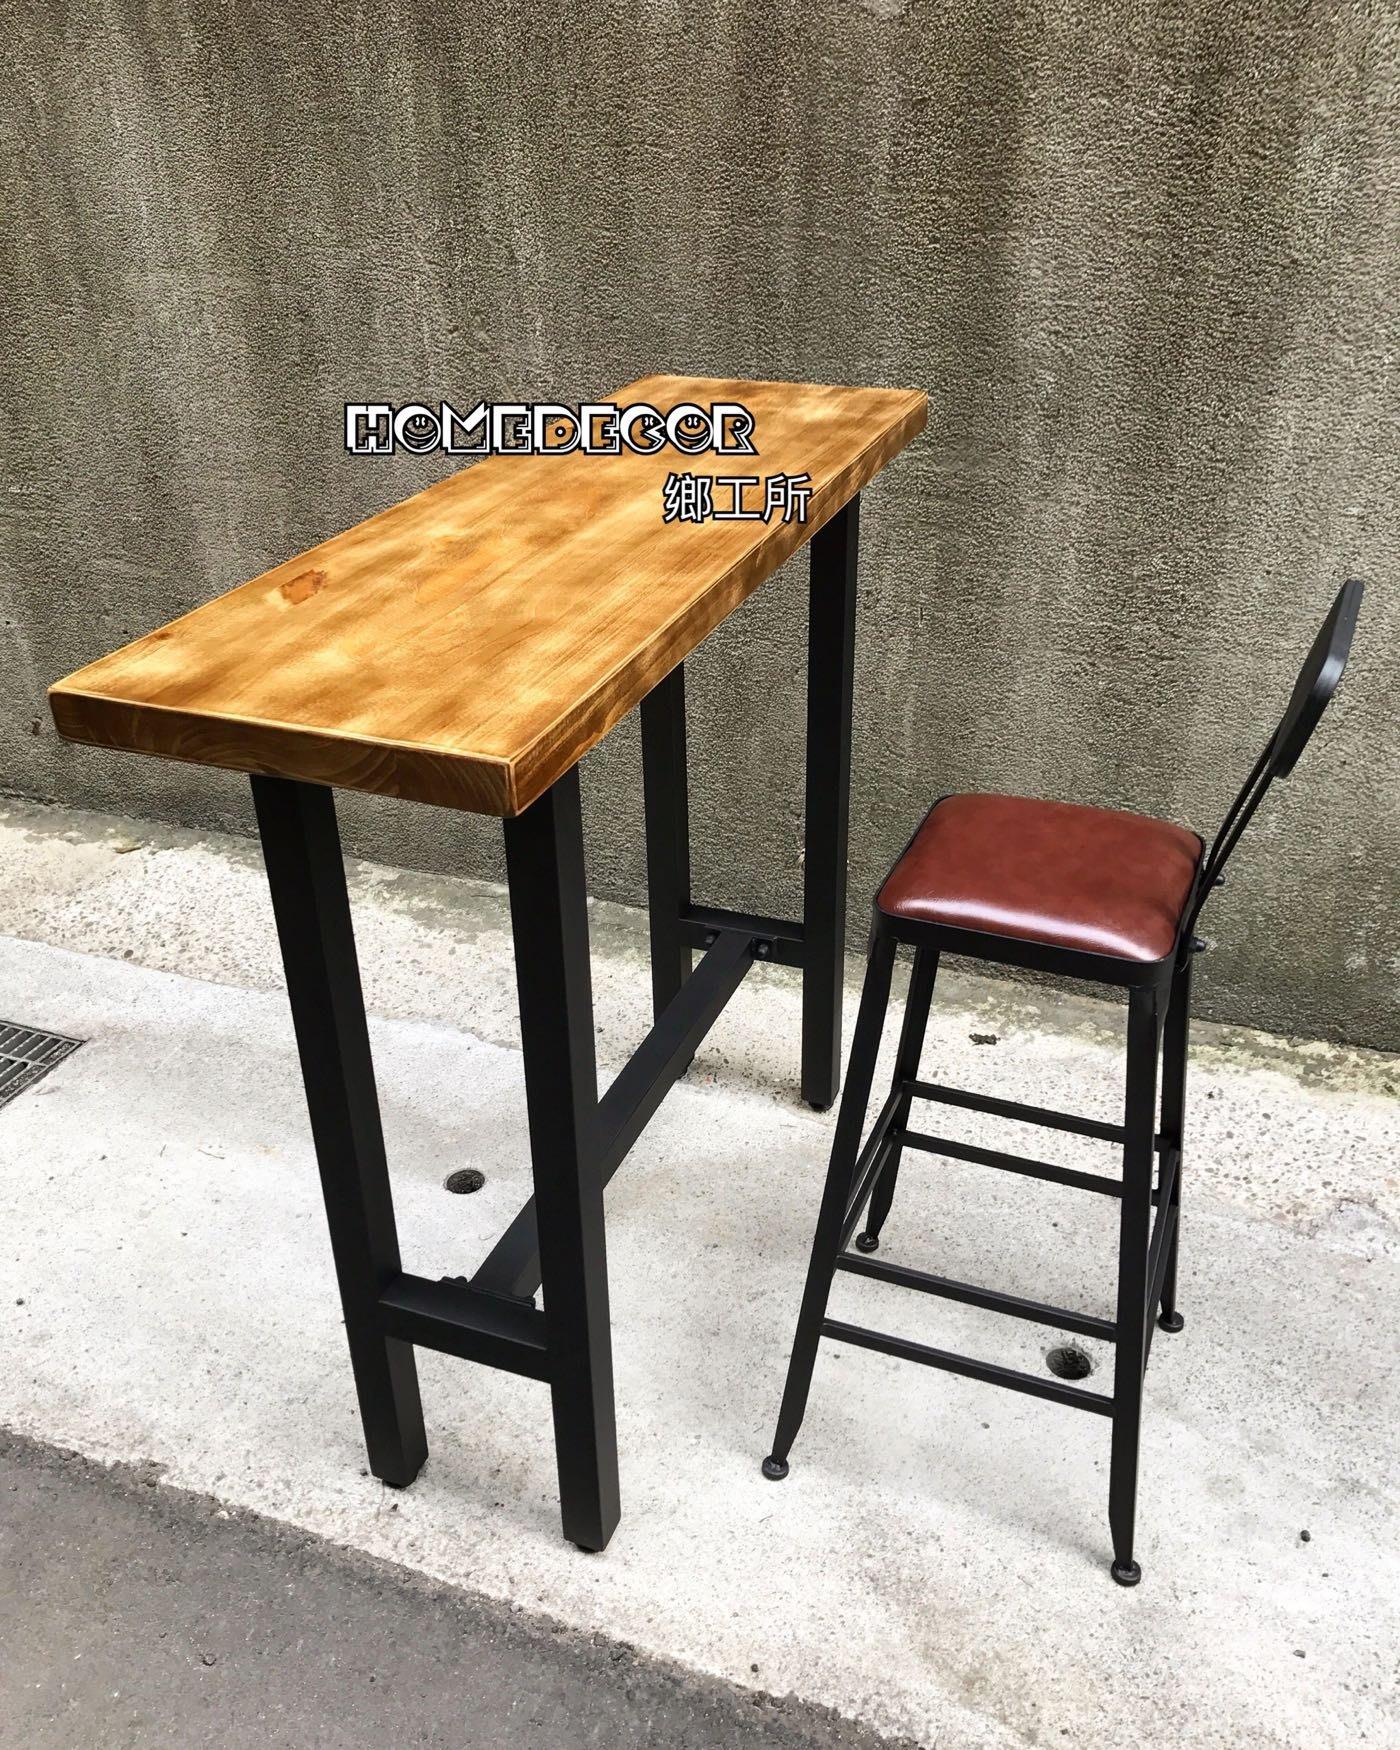 HomeDecor鄉工所 工業風家具 長桌 吧台桌 吧檯桌 吧桌 桌子 實木 方桌 咖啡桌 咖啡廳 美式鄉村復古LOFT